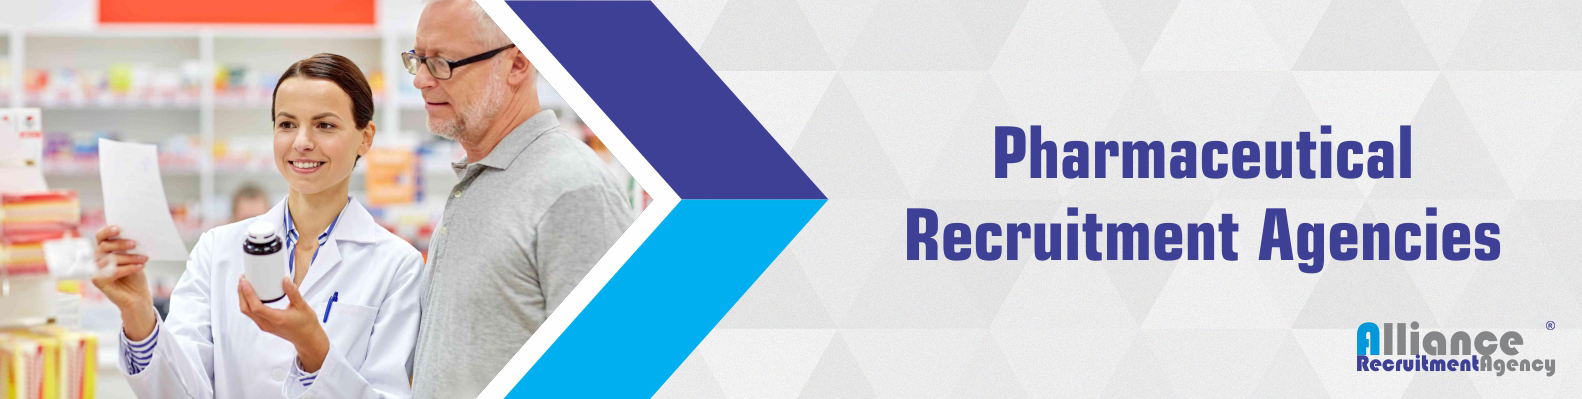 Pharmaceutical Recruitment Agencies - Pharma Consulting